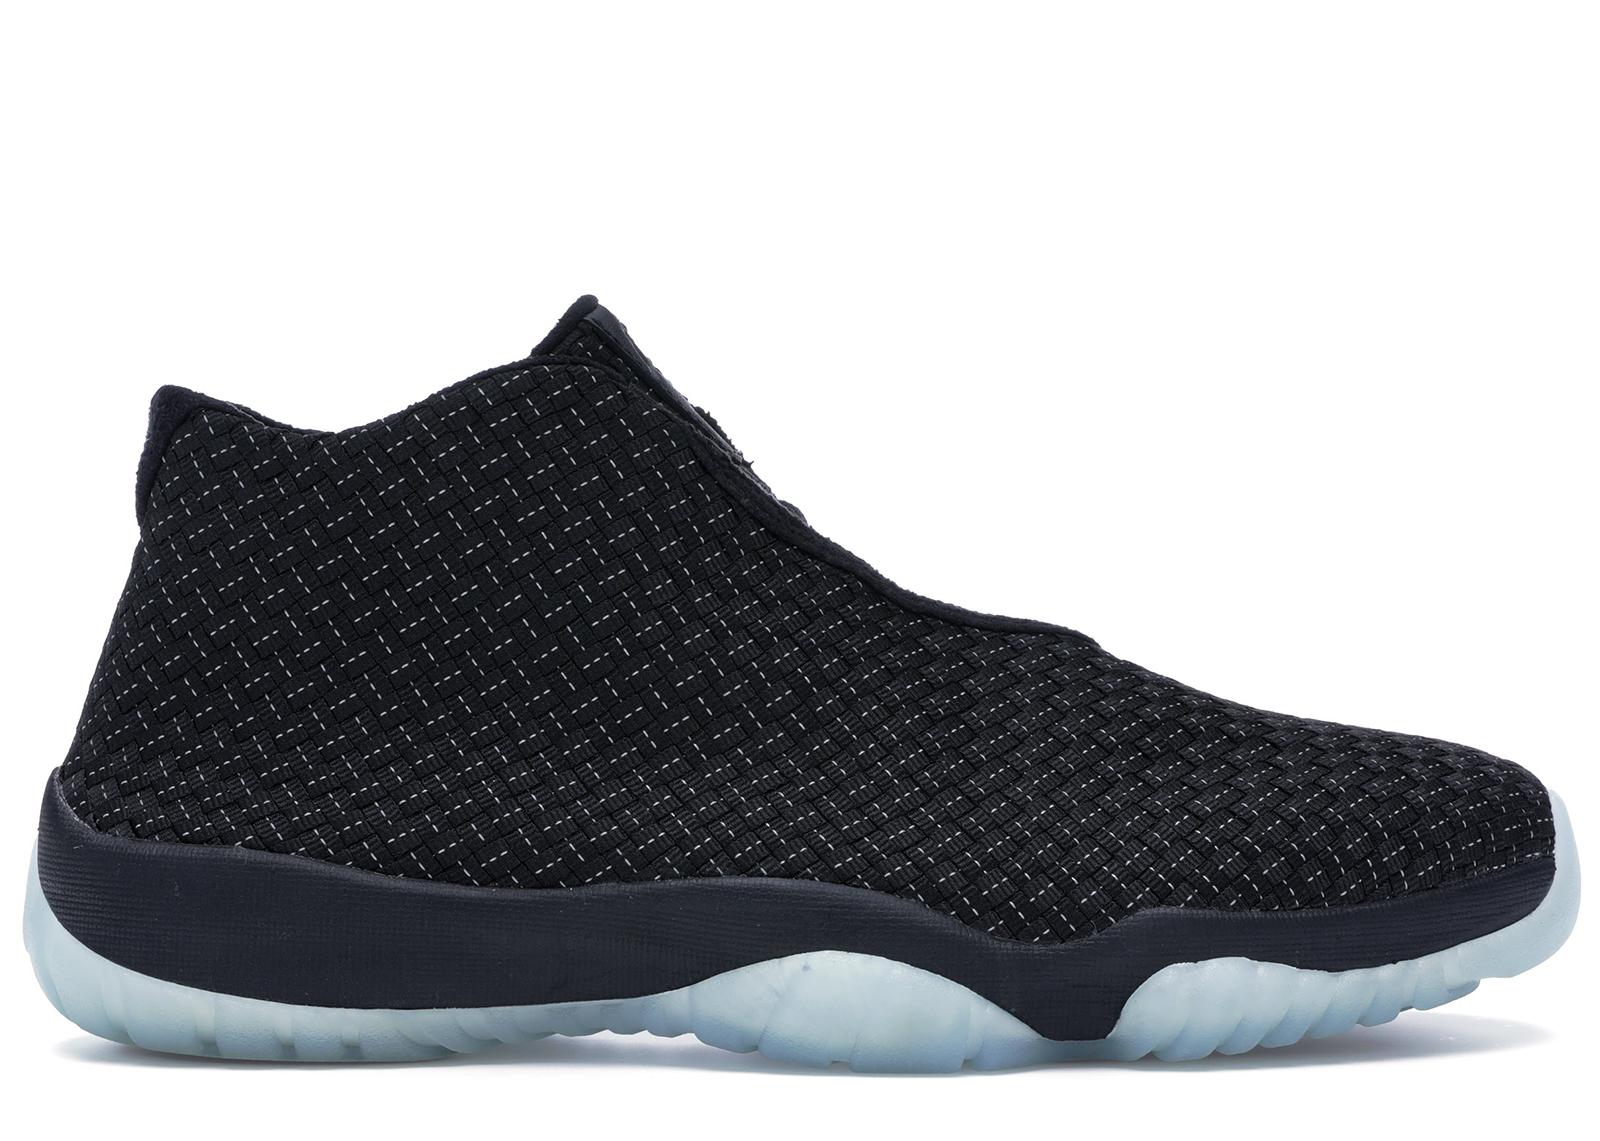 Acheter Air Jordan Future Chaussures et sneakers neuves